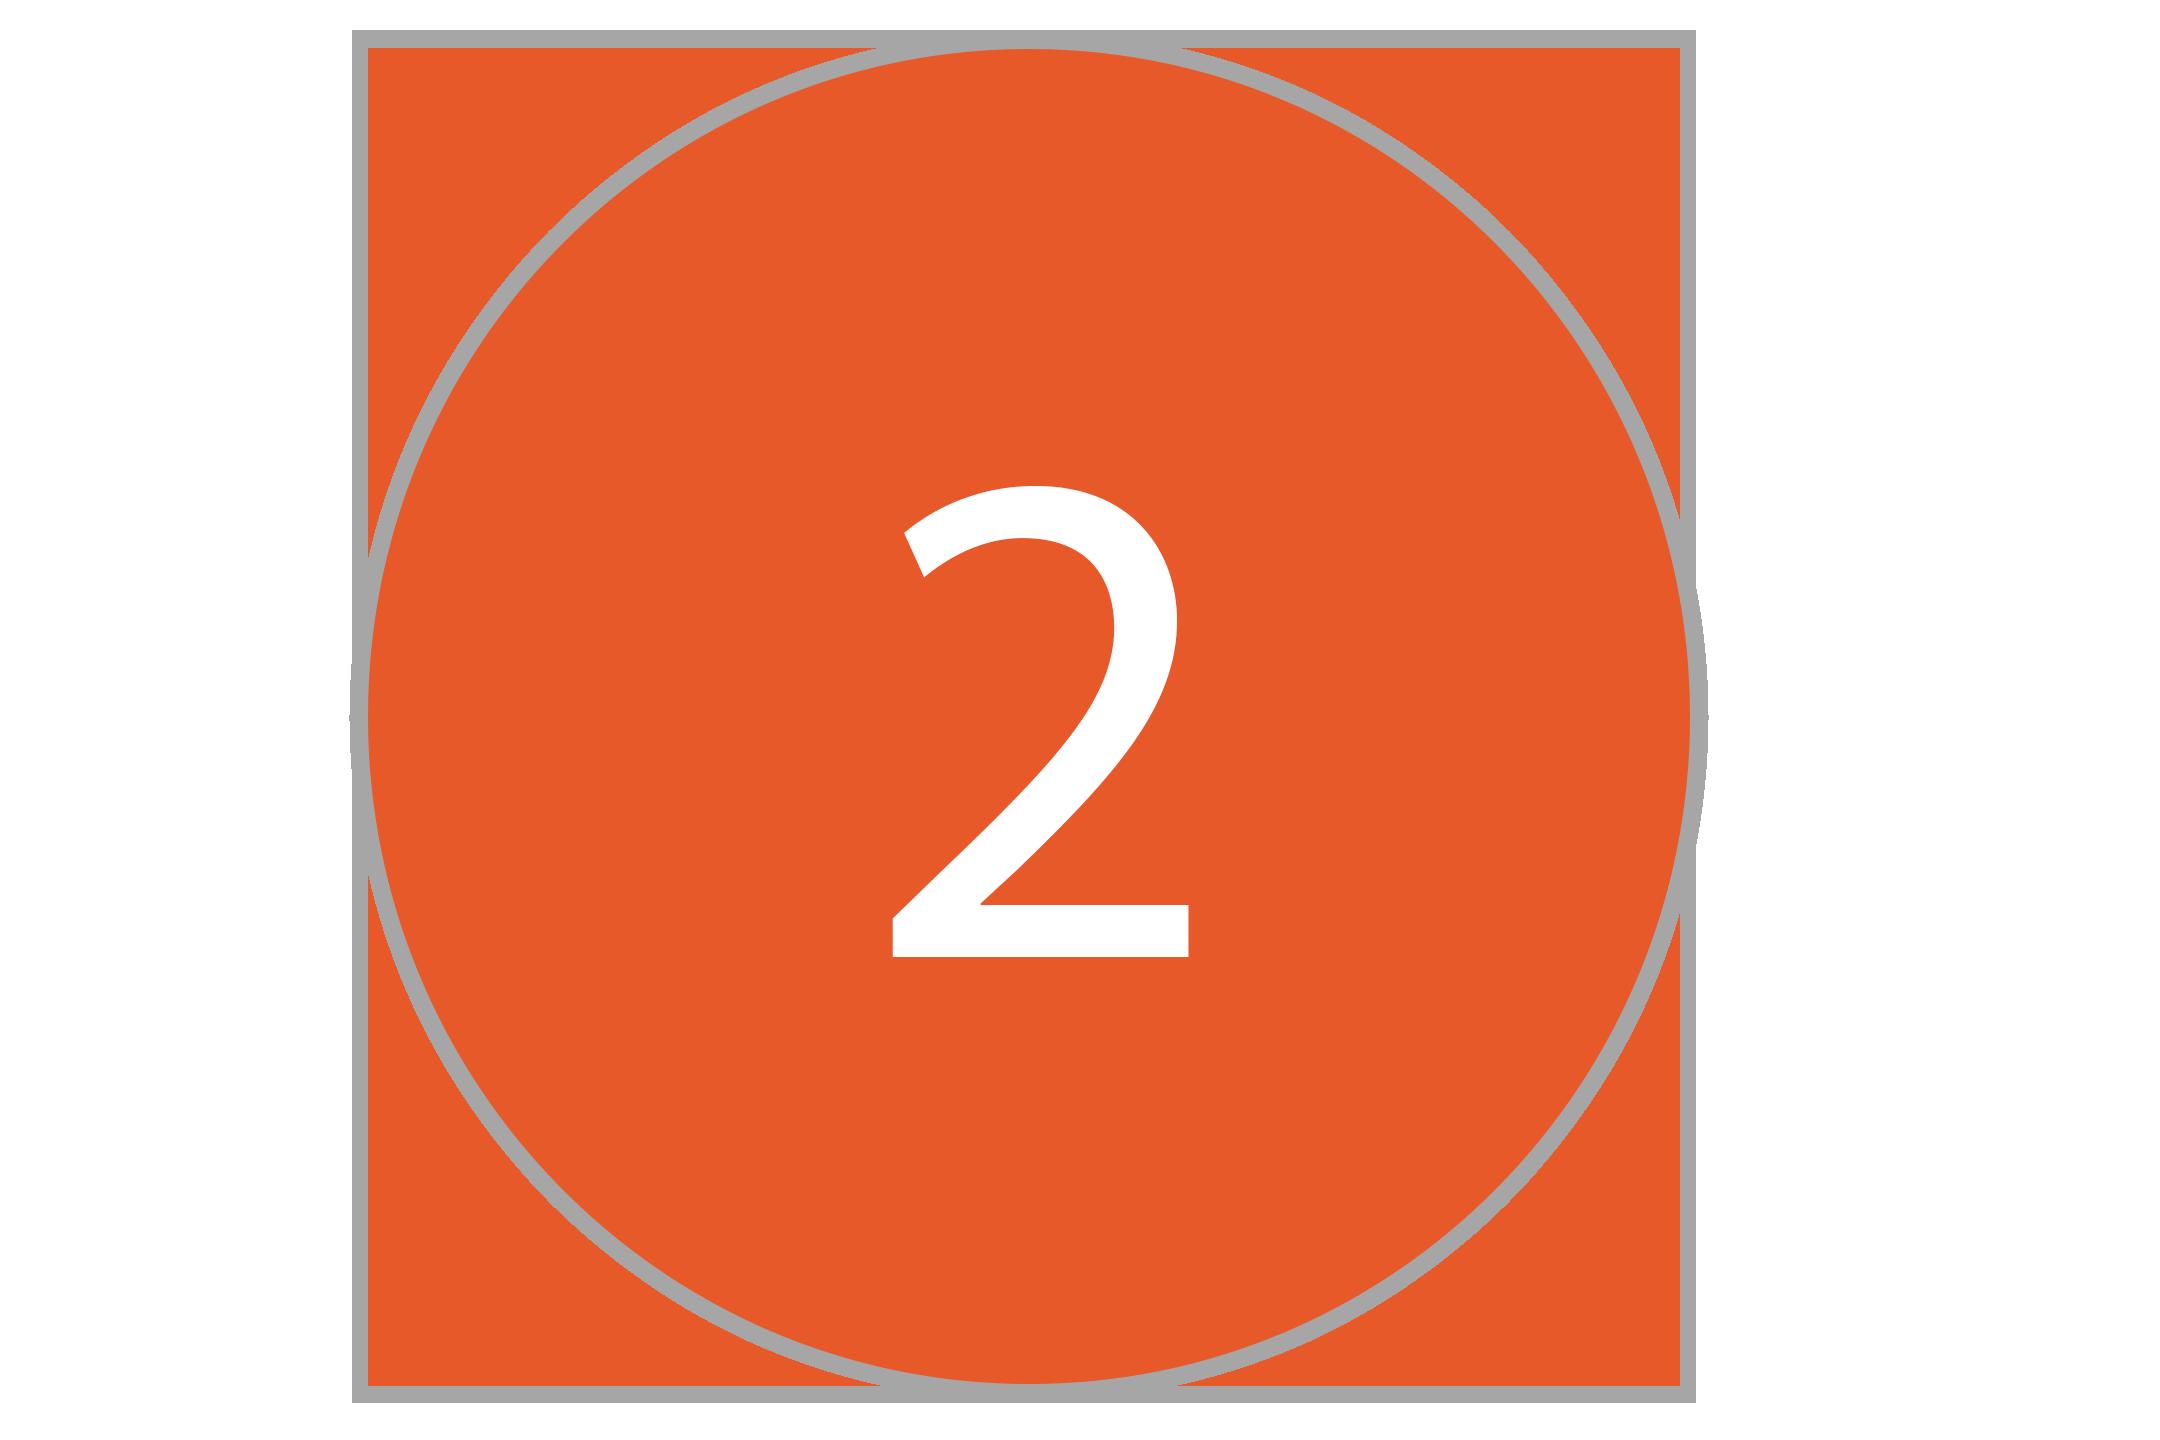 cirkel 2